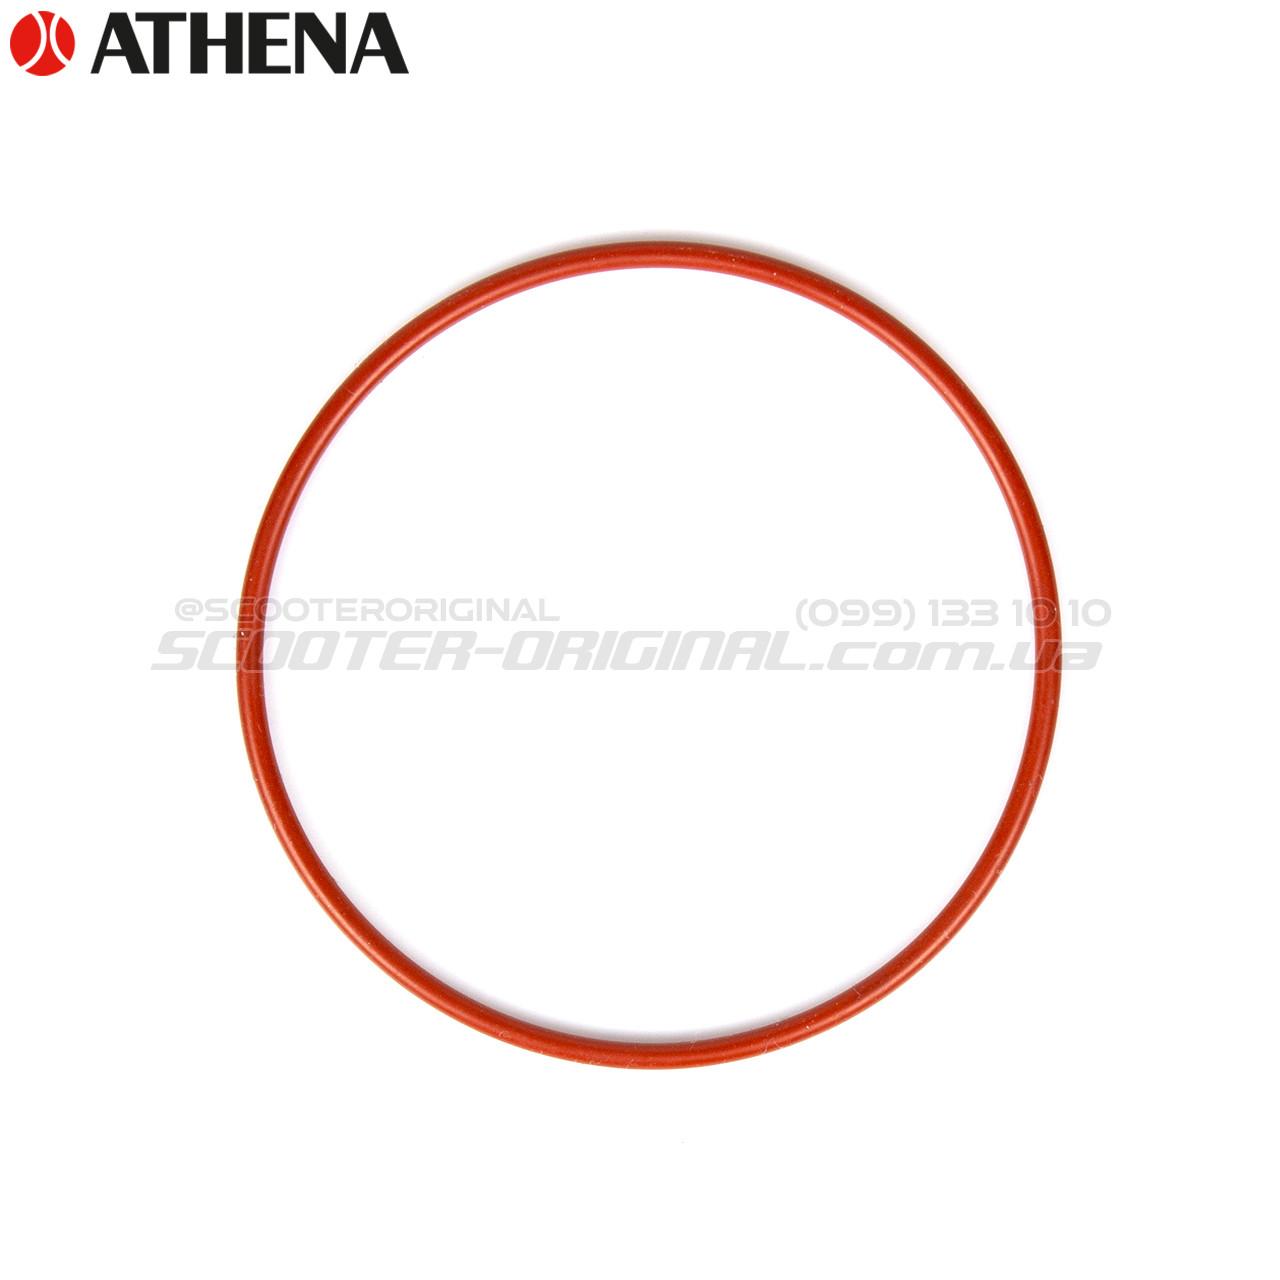 Прокладка головки цилиндра ATHENA Ø 50,5x54,06x1,78 мм Minarelli Vertical (Yamaha)